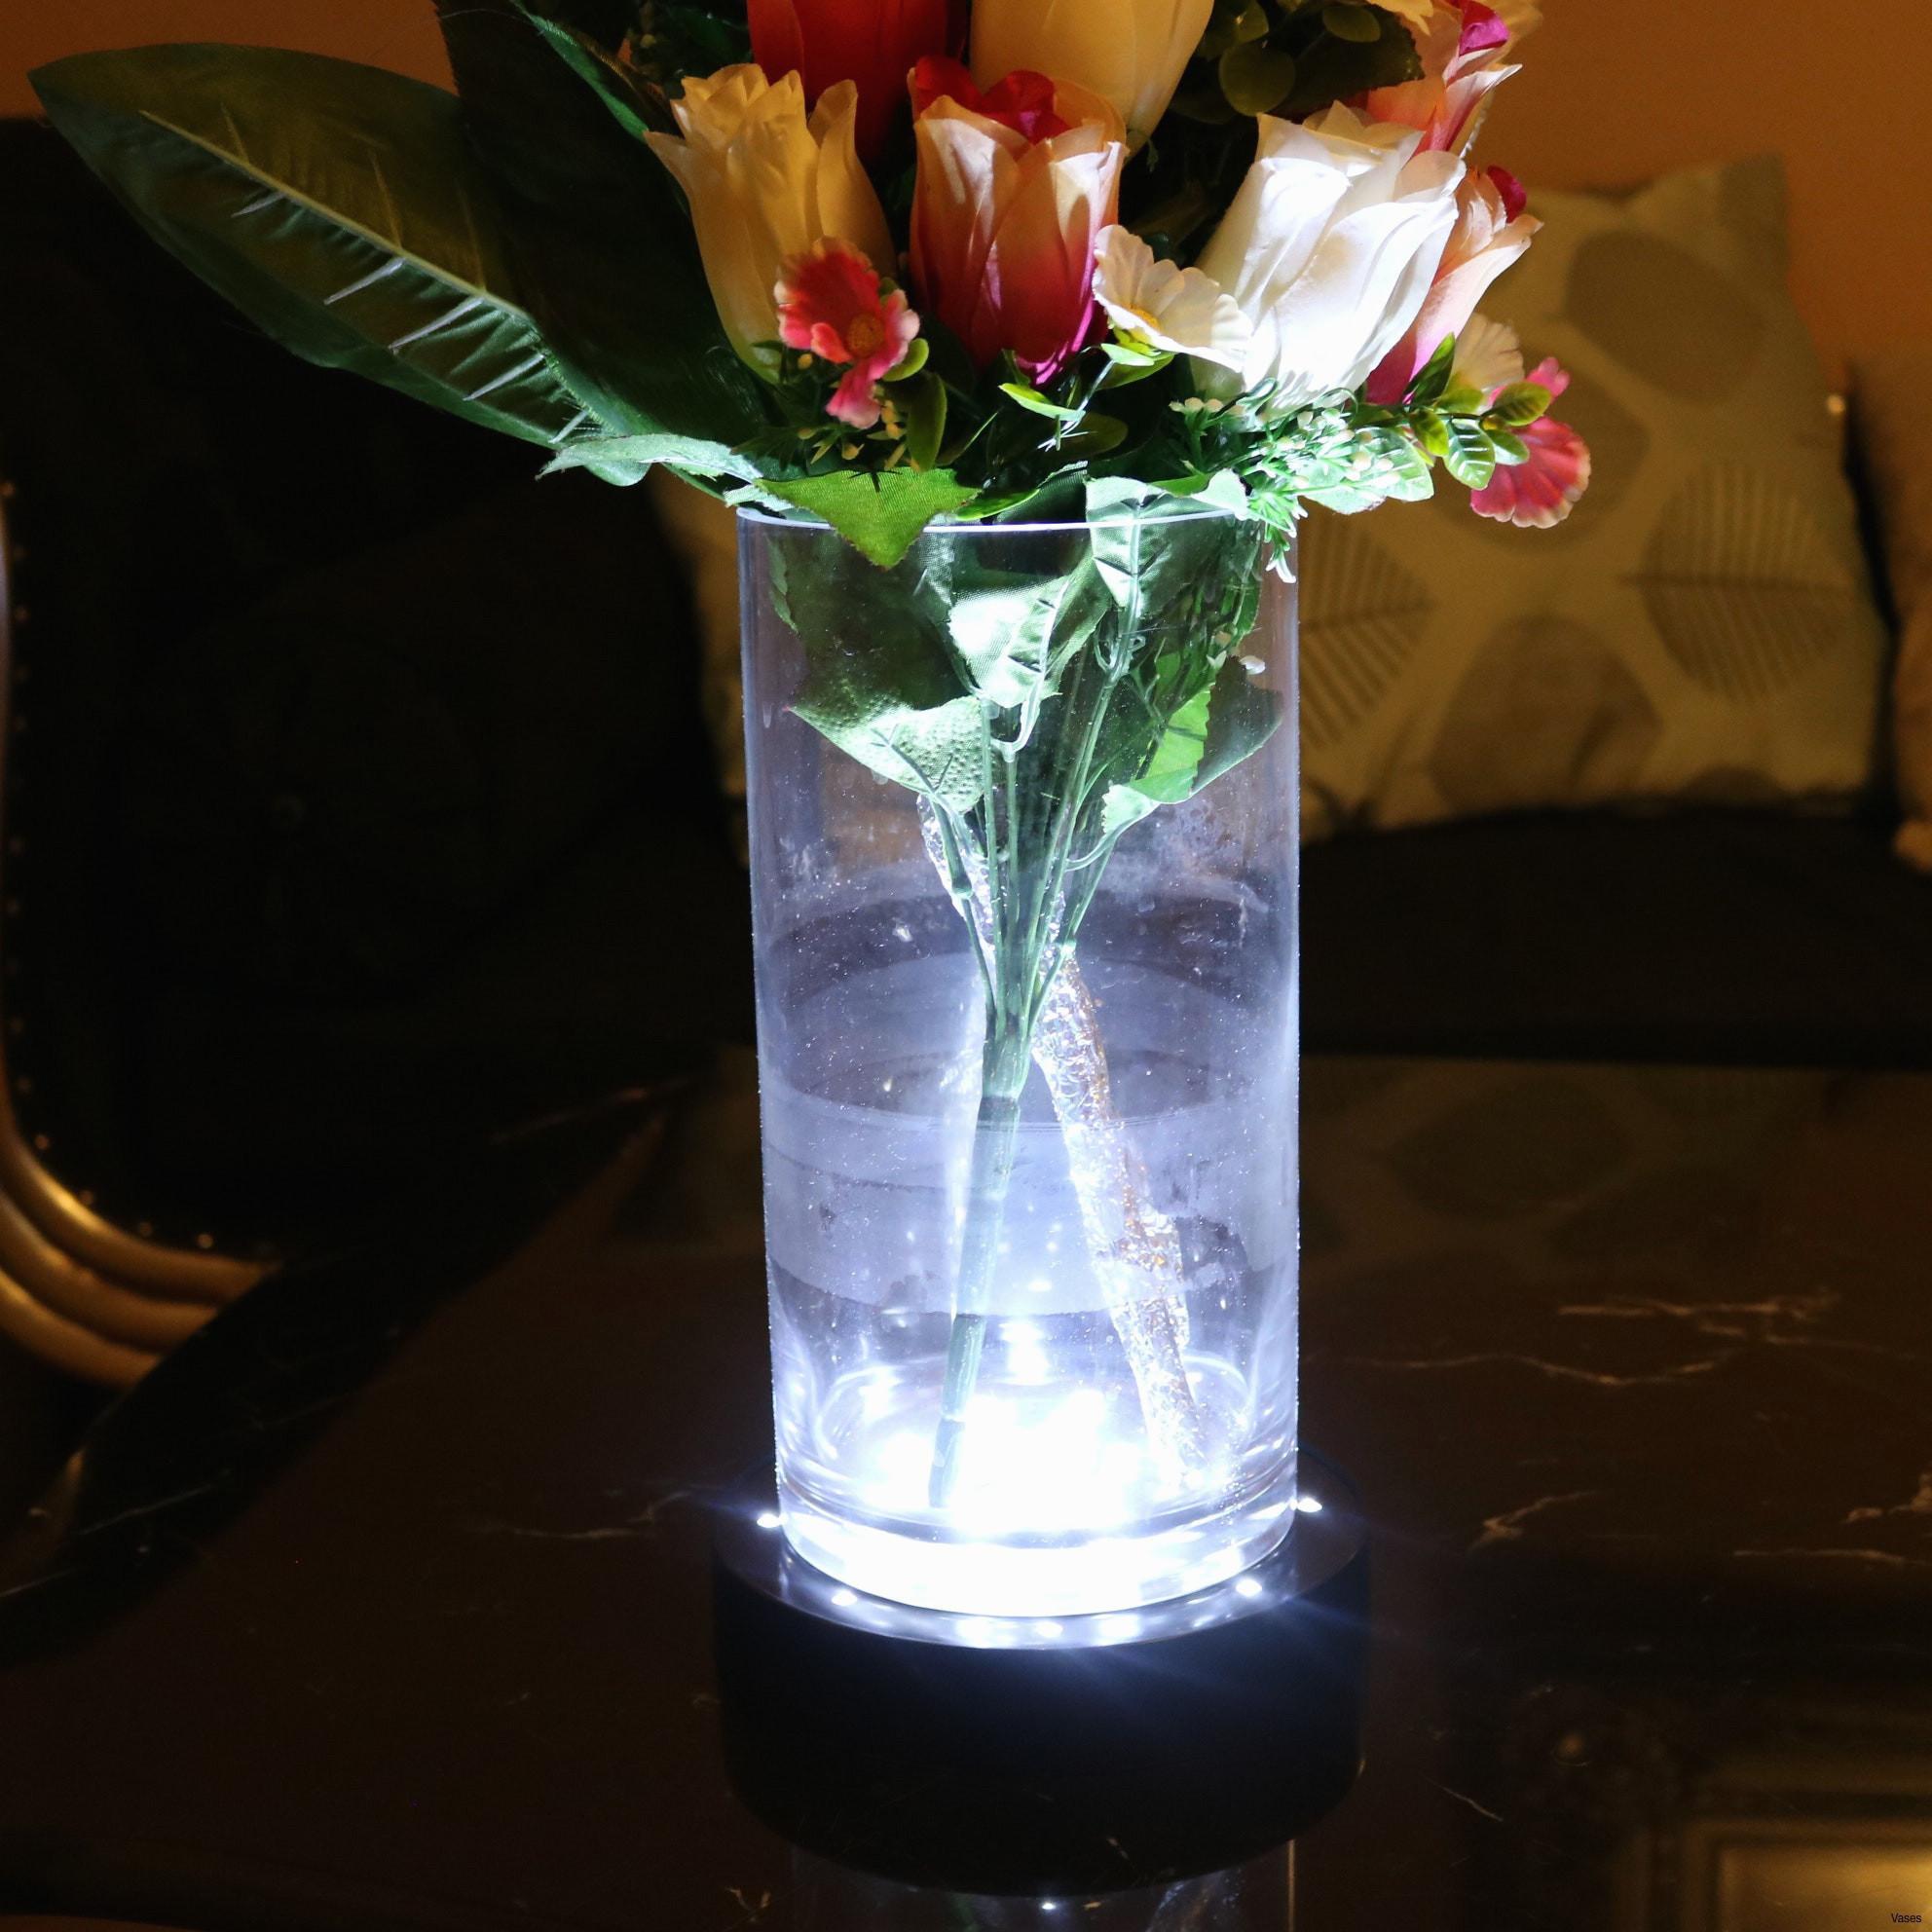 tall floor vase flower arrangements of 6 elegant flower die cut pictures best roses flower regarding inspirational vases disposable plastic single cheap flower rose vasei 0d design of 6 elegant flower die